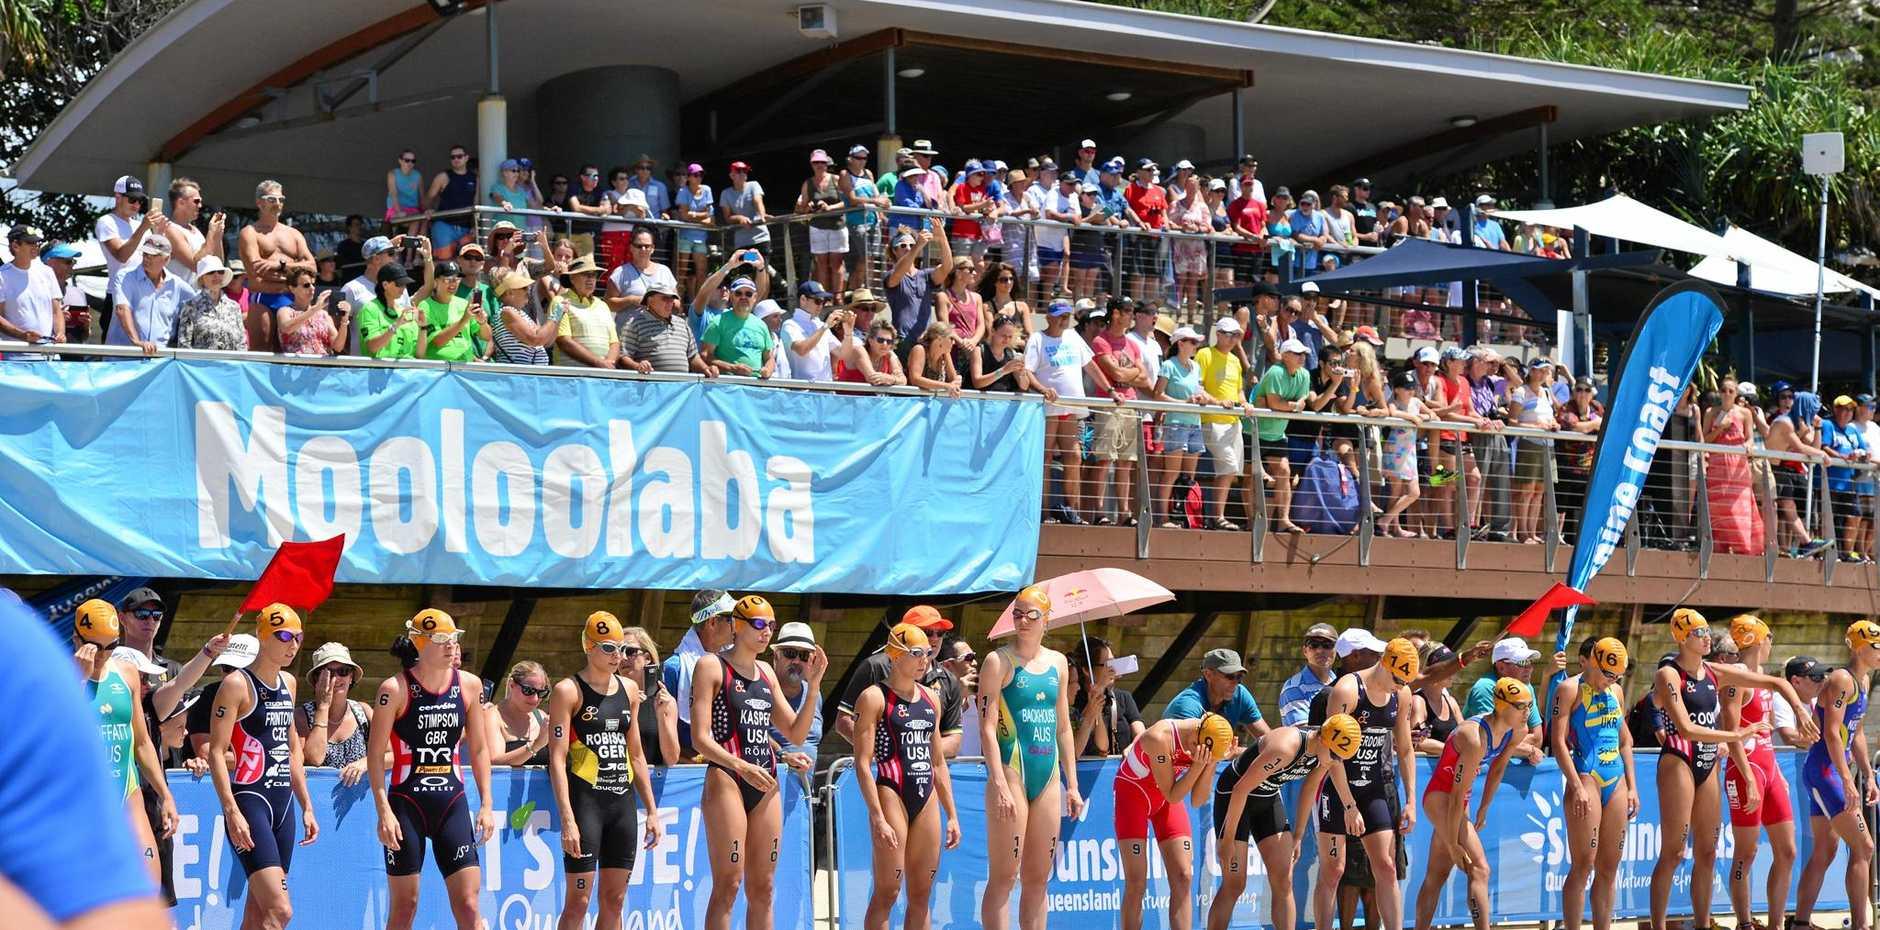 The start of the Mooloolaba ITU Triathlon World Cup women's race.